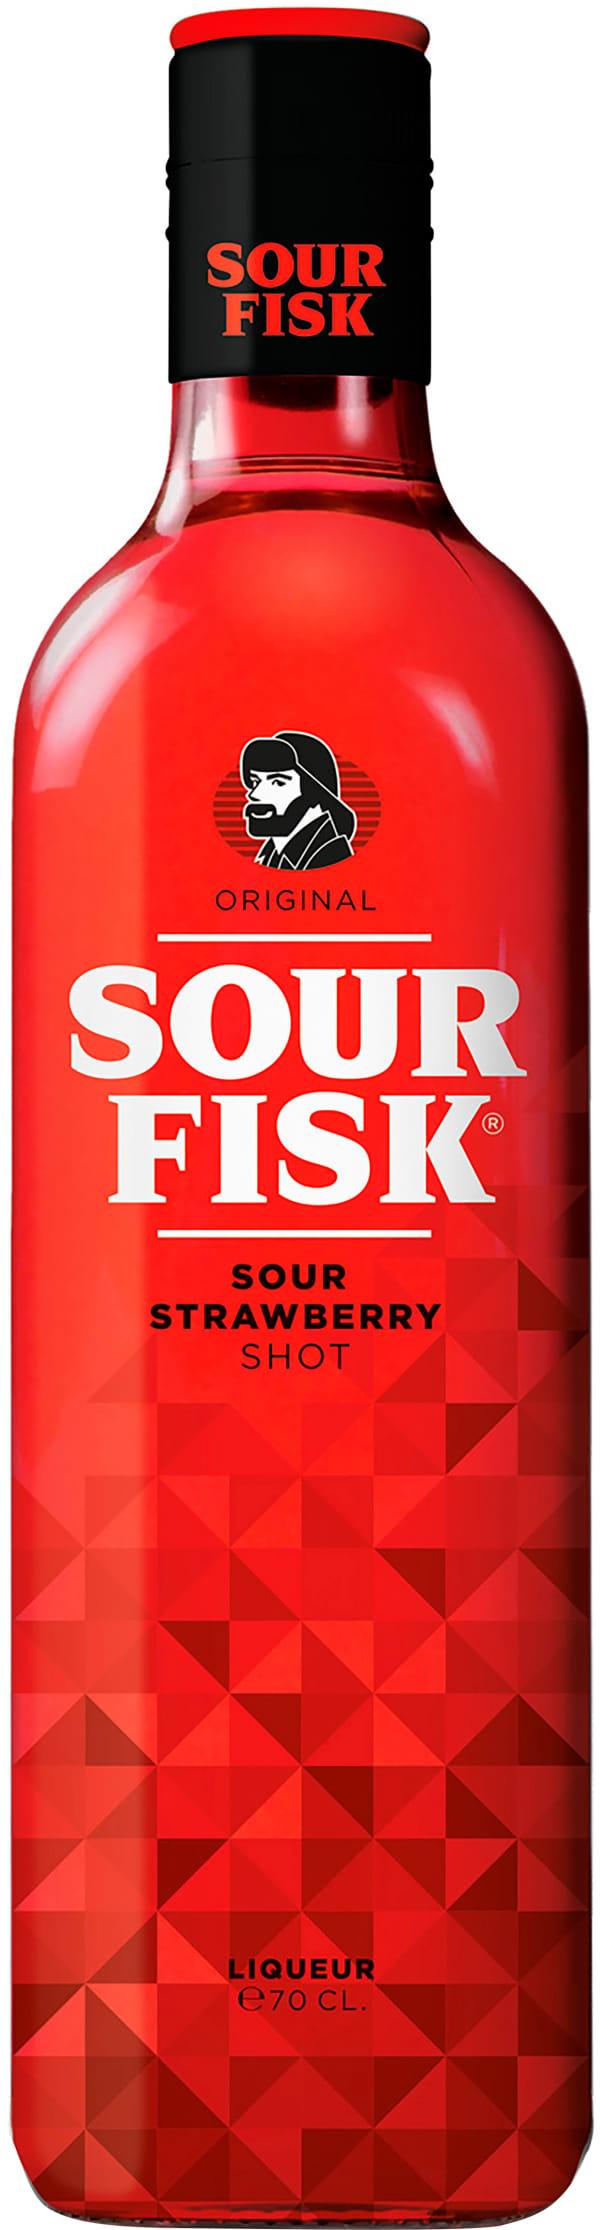 Sour Fisk Sour Strawberry